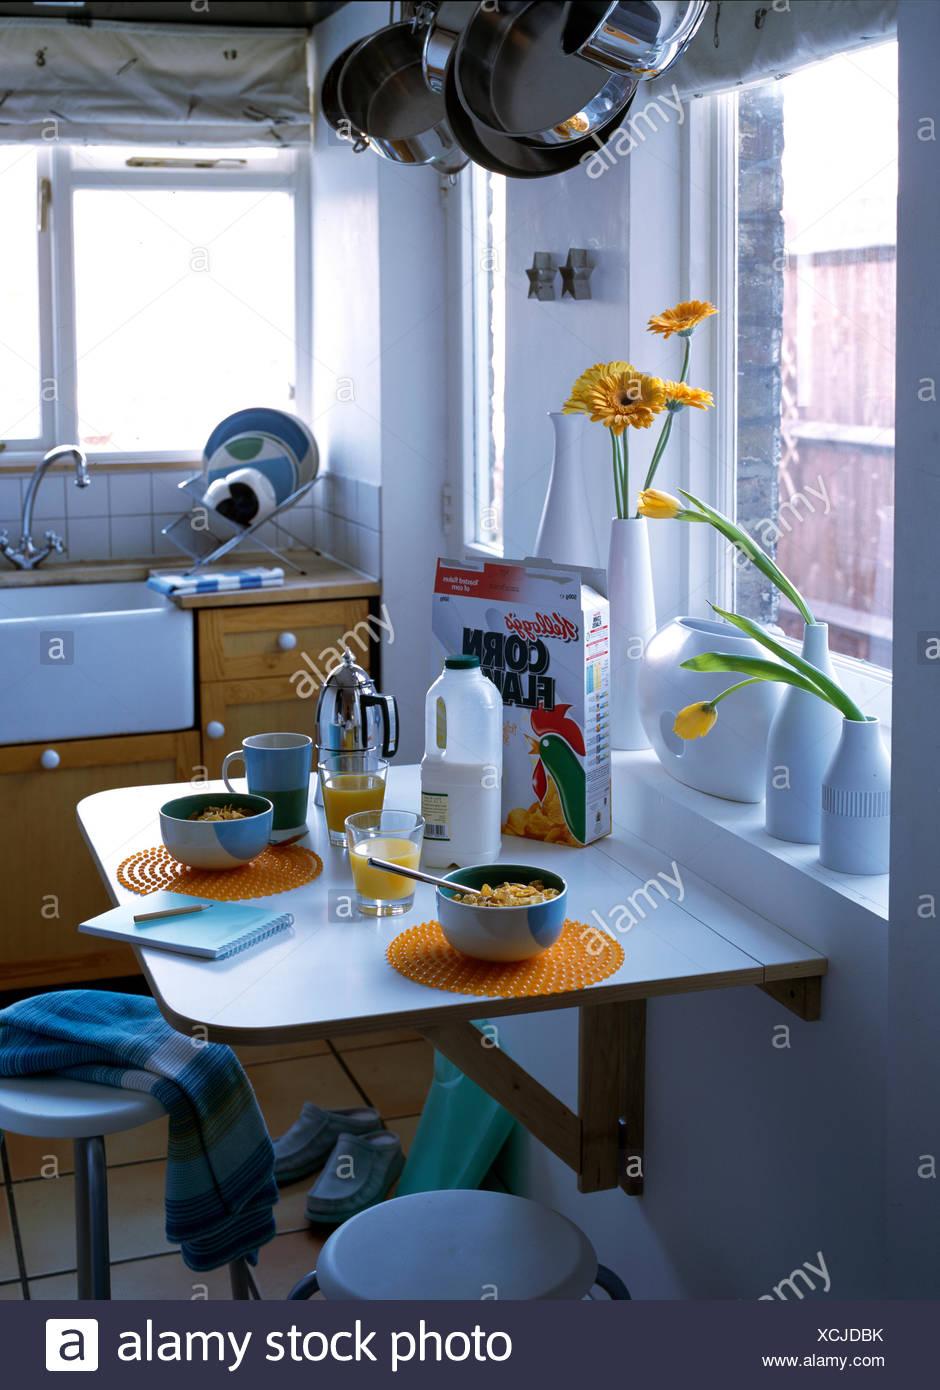 Small Kitchen Stock Photos & Small Kitchen Stock Images - Alamy